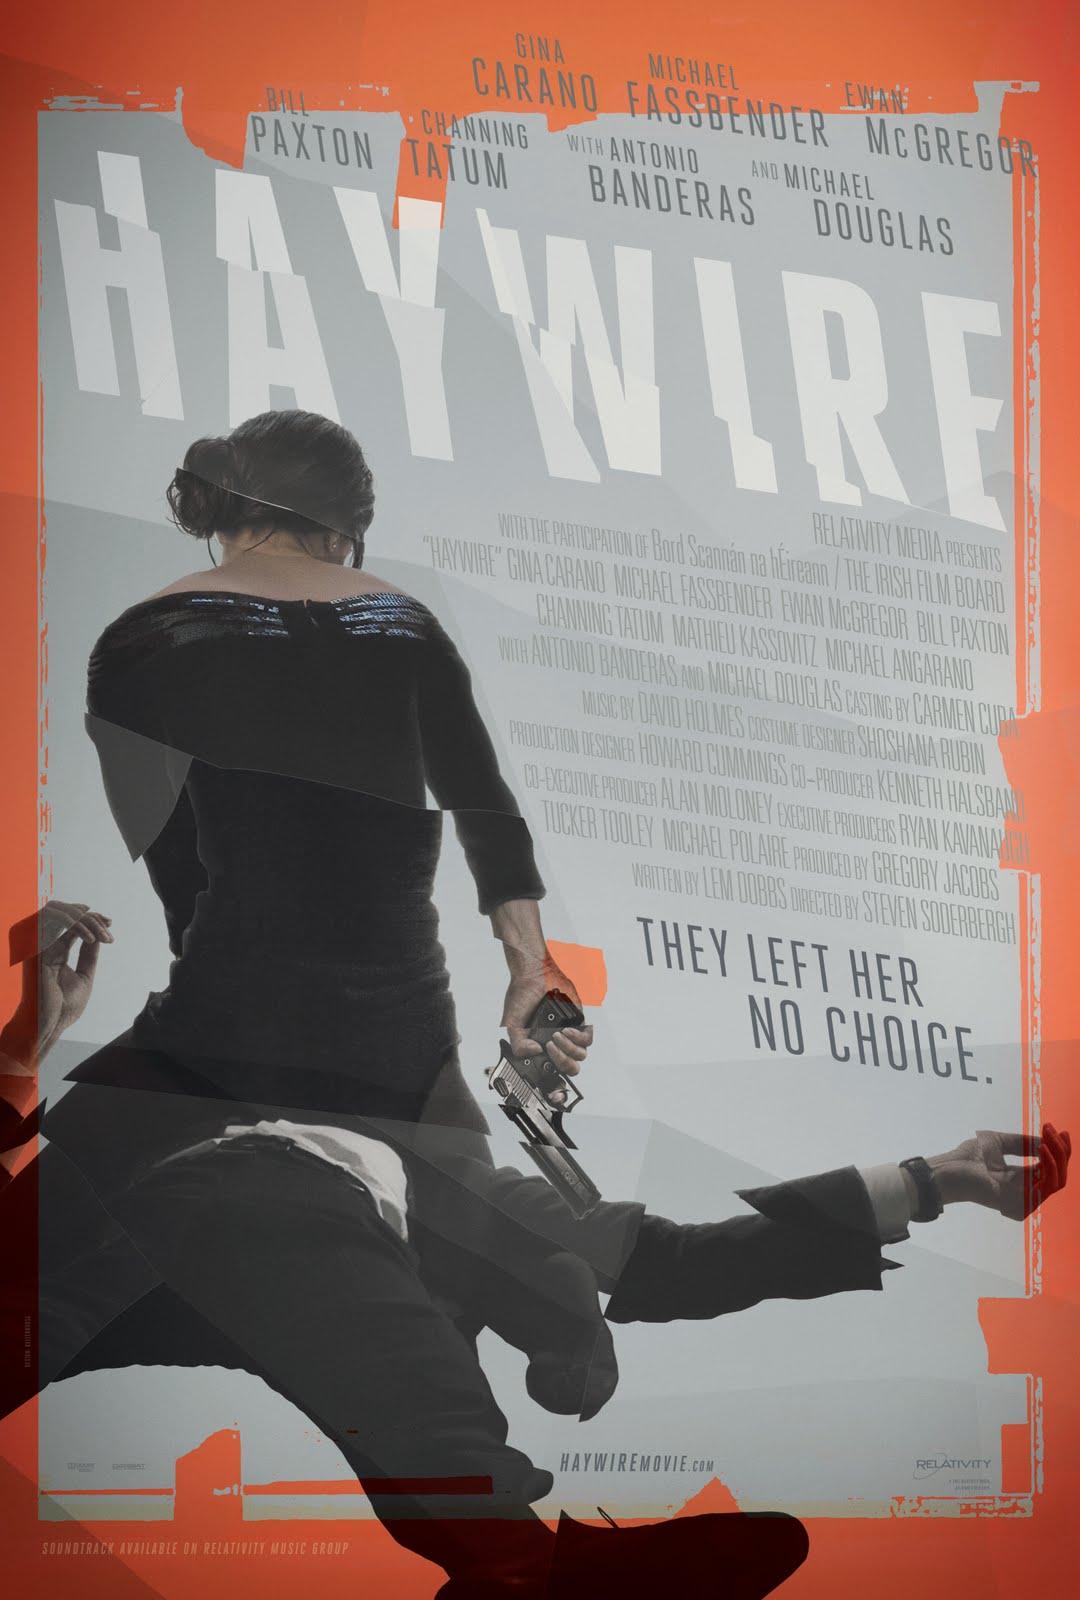 http://1.bp.blogspot.com/-Ech4jxtx7Wo/TrwYTFFmUeI/AAAAAAAAB9c/pCDRZu2lcKM/s1600/haywire-movie-poster.jpg